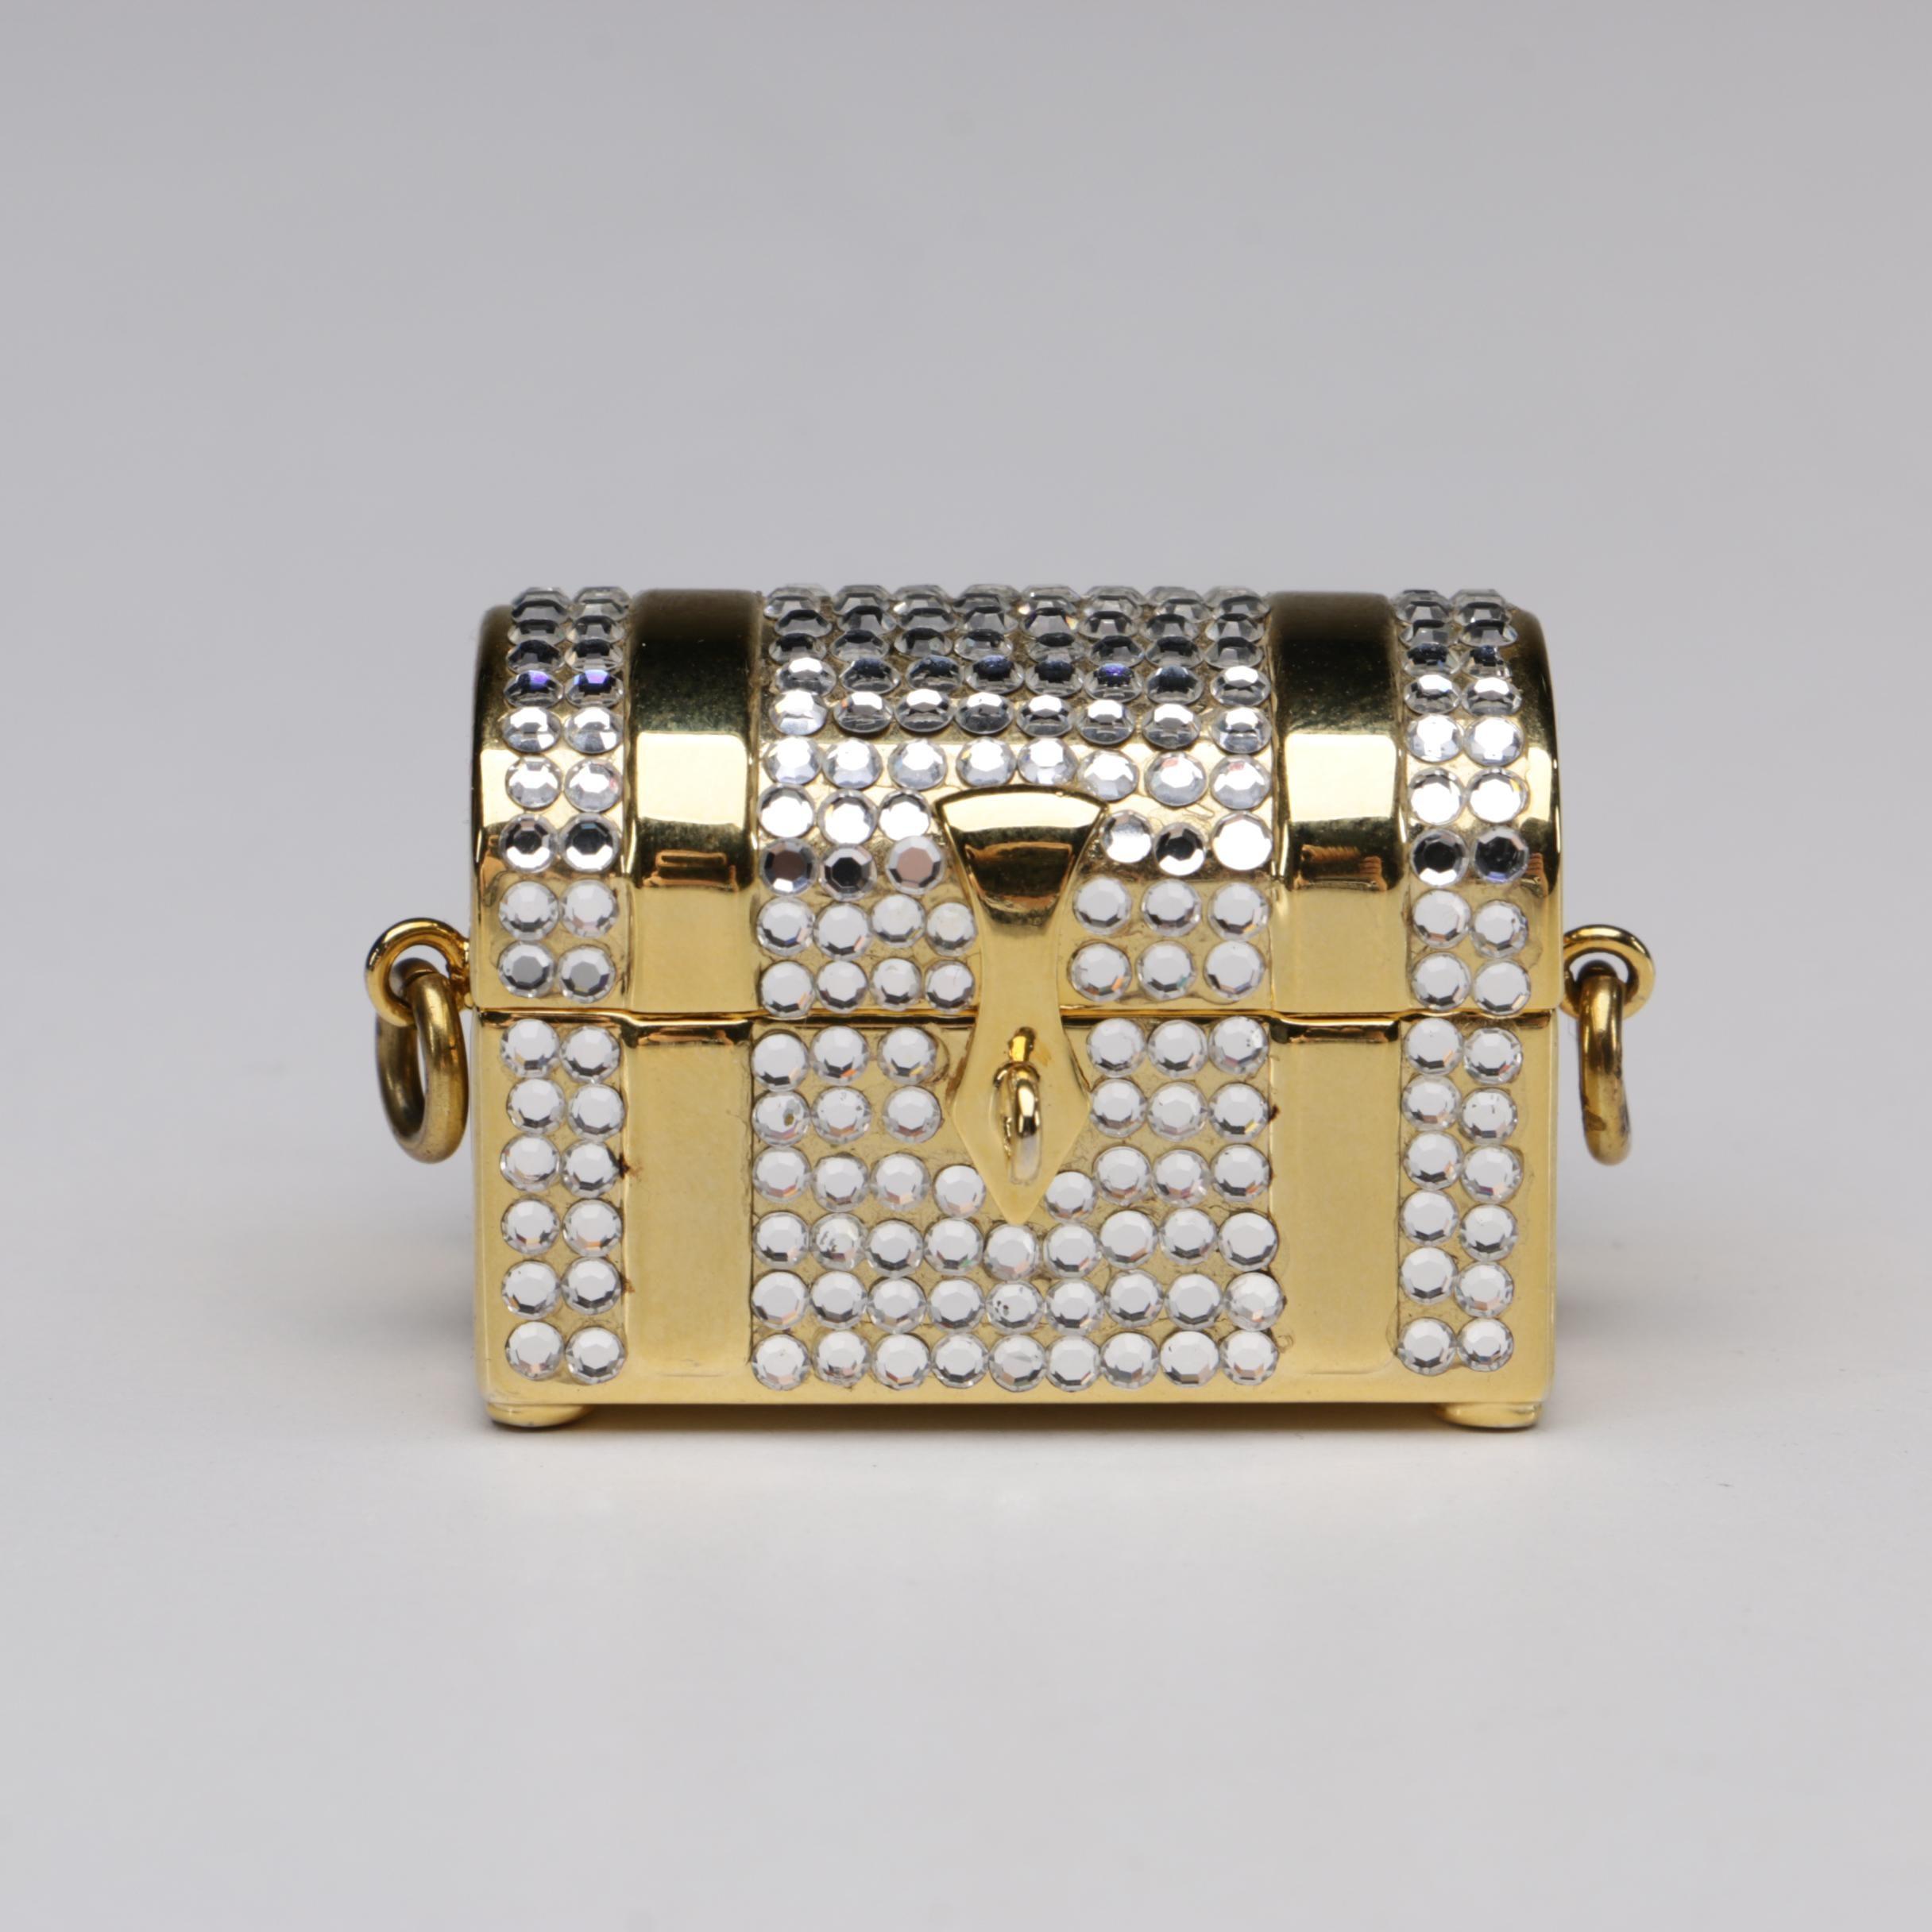 Judith Leiber Swarovski Crystal Treasure Chest Pill Box